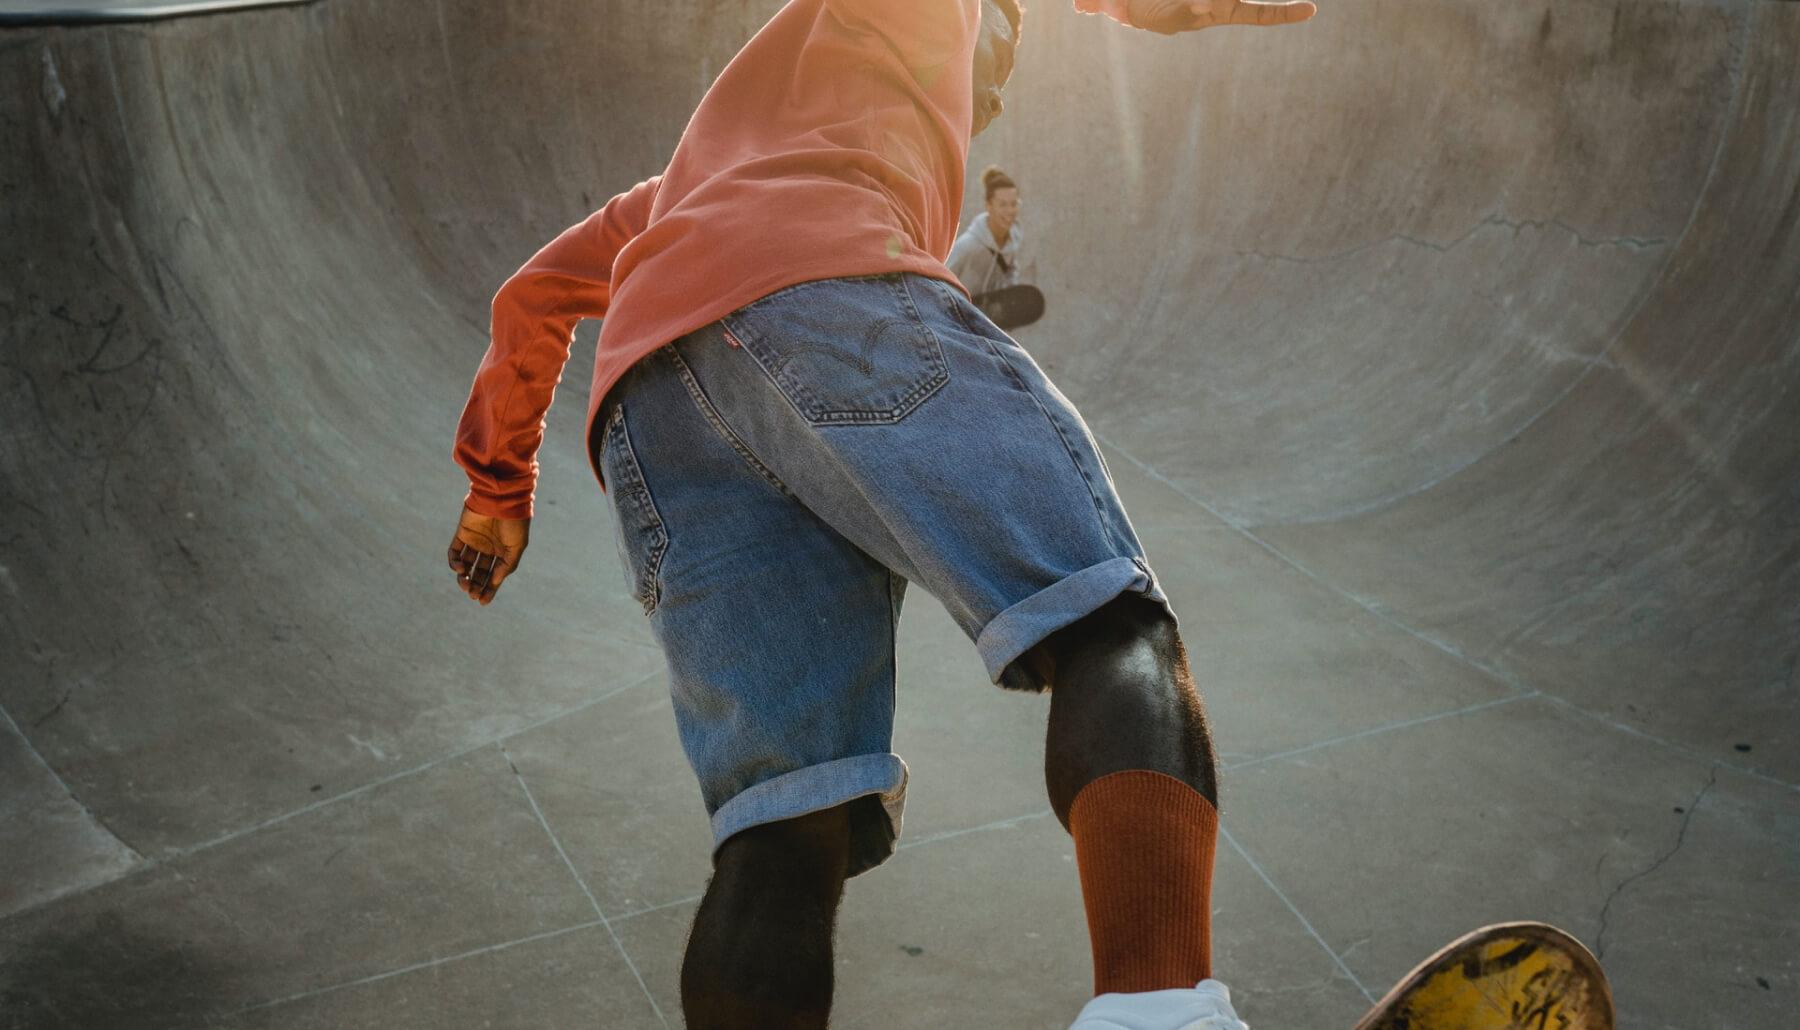 Skater in a skatepark